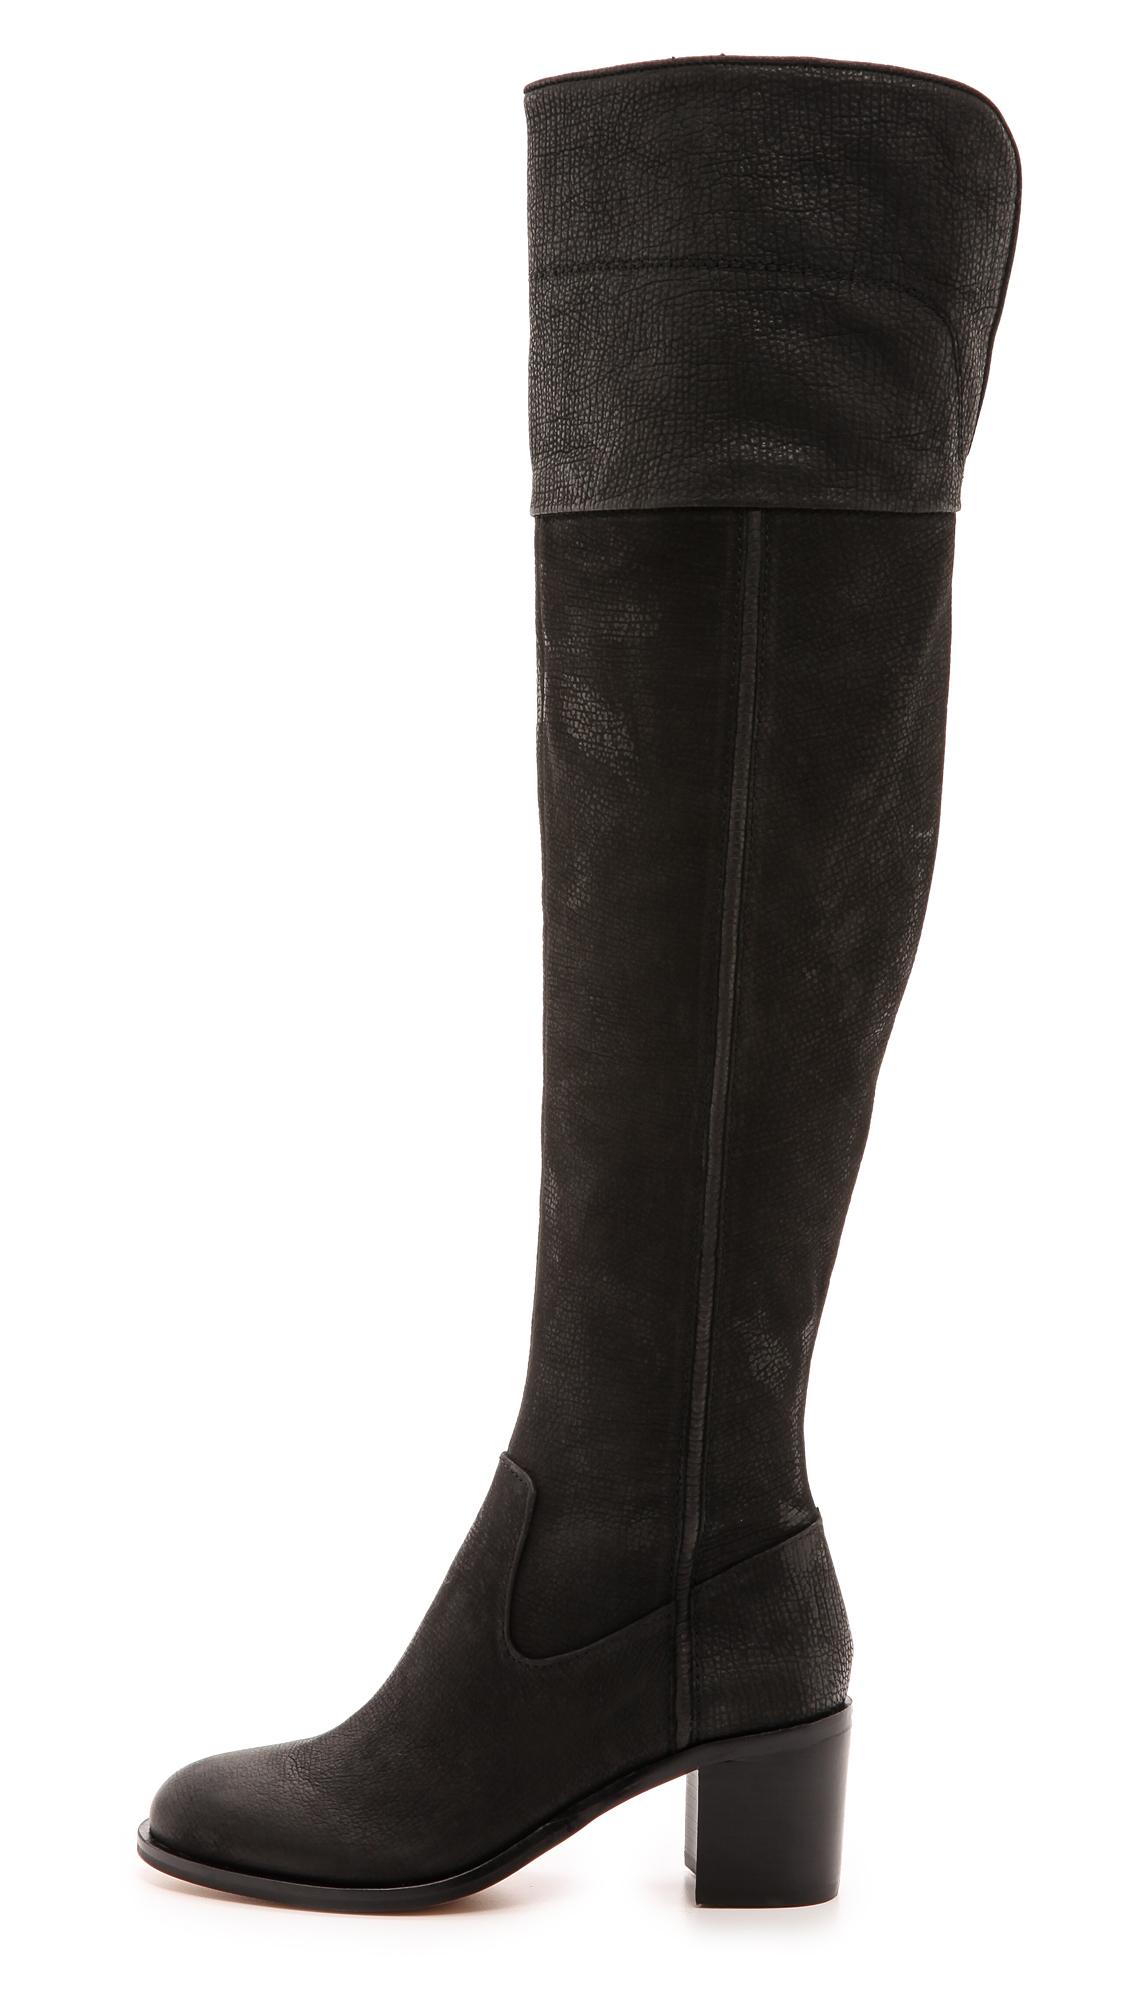 71bb582a4c0 Sam Edelman Joplin Over the Knee Boots | SHOPBOP